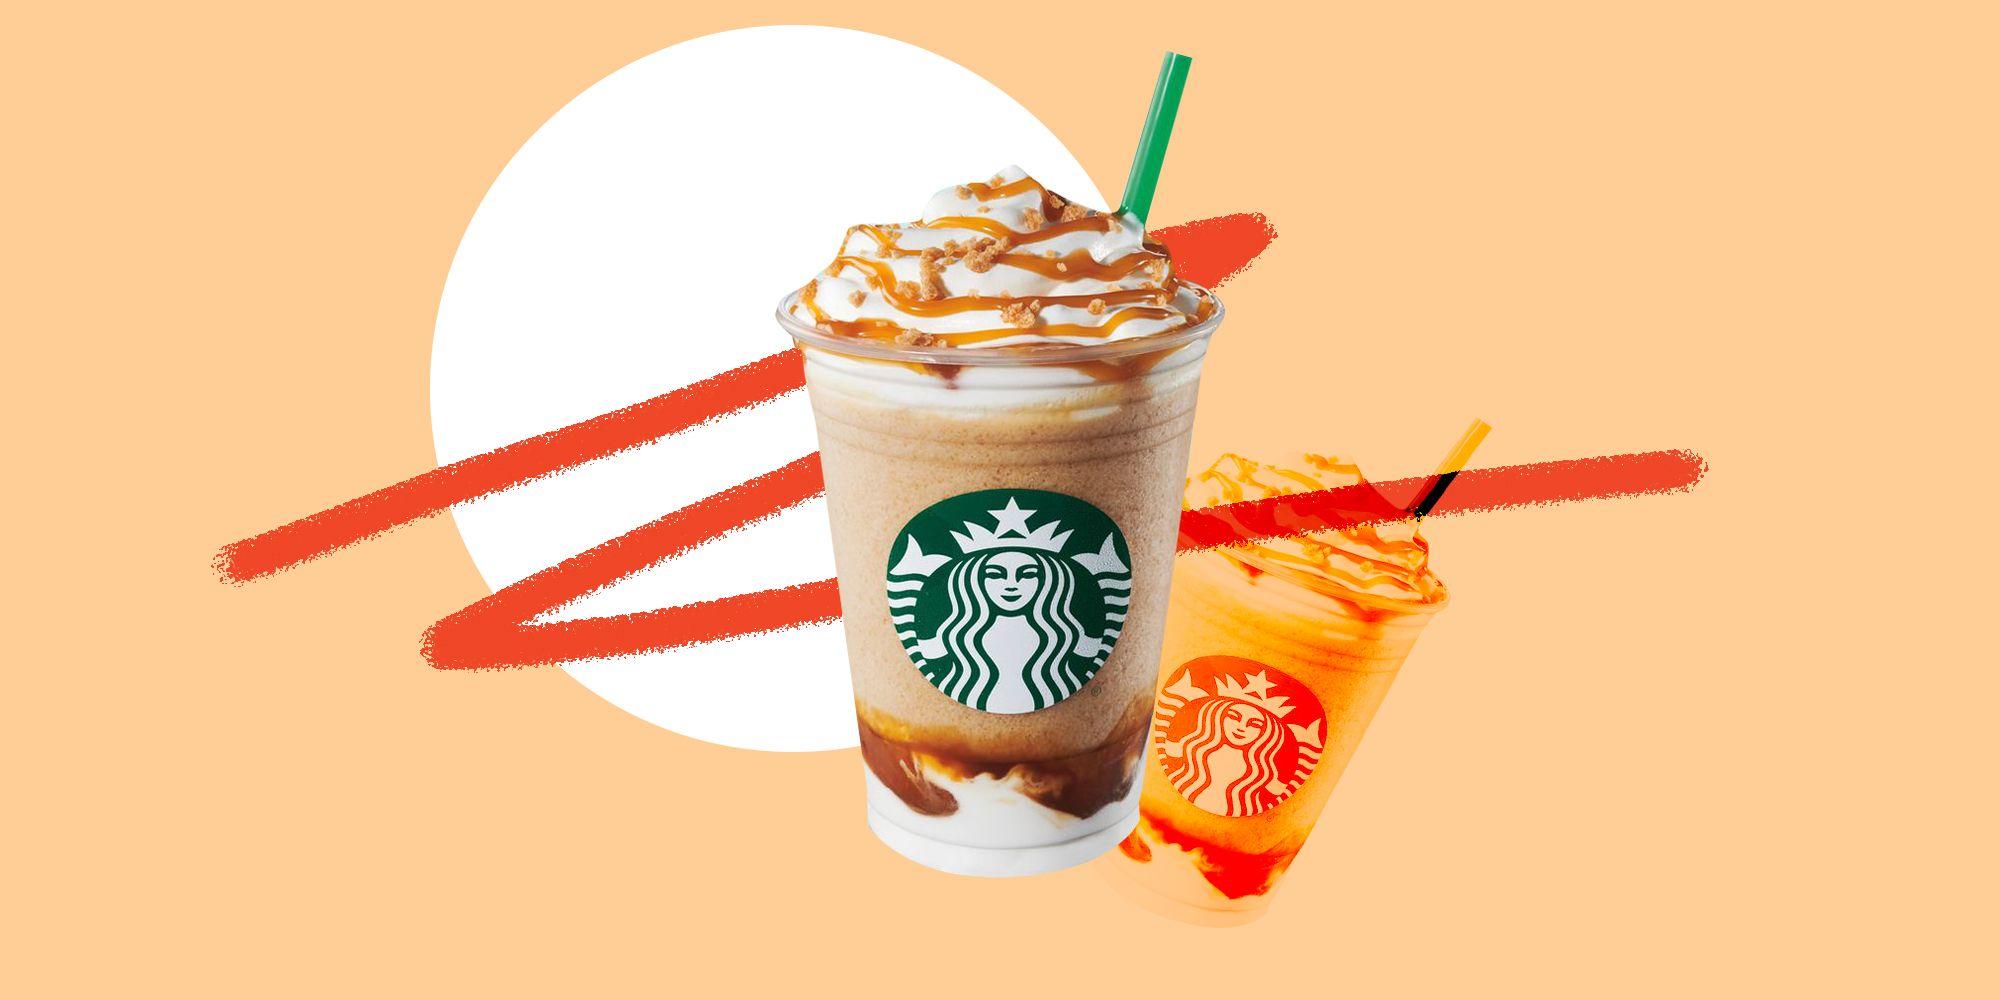 Starbucks Has Summer Frappuccinos Meet The Mocha Cooke Crumble